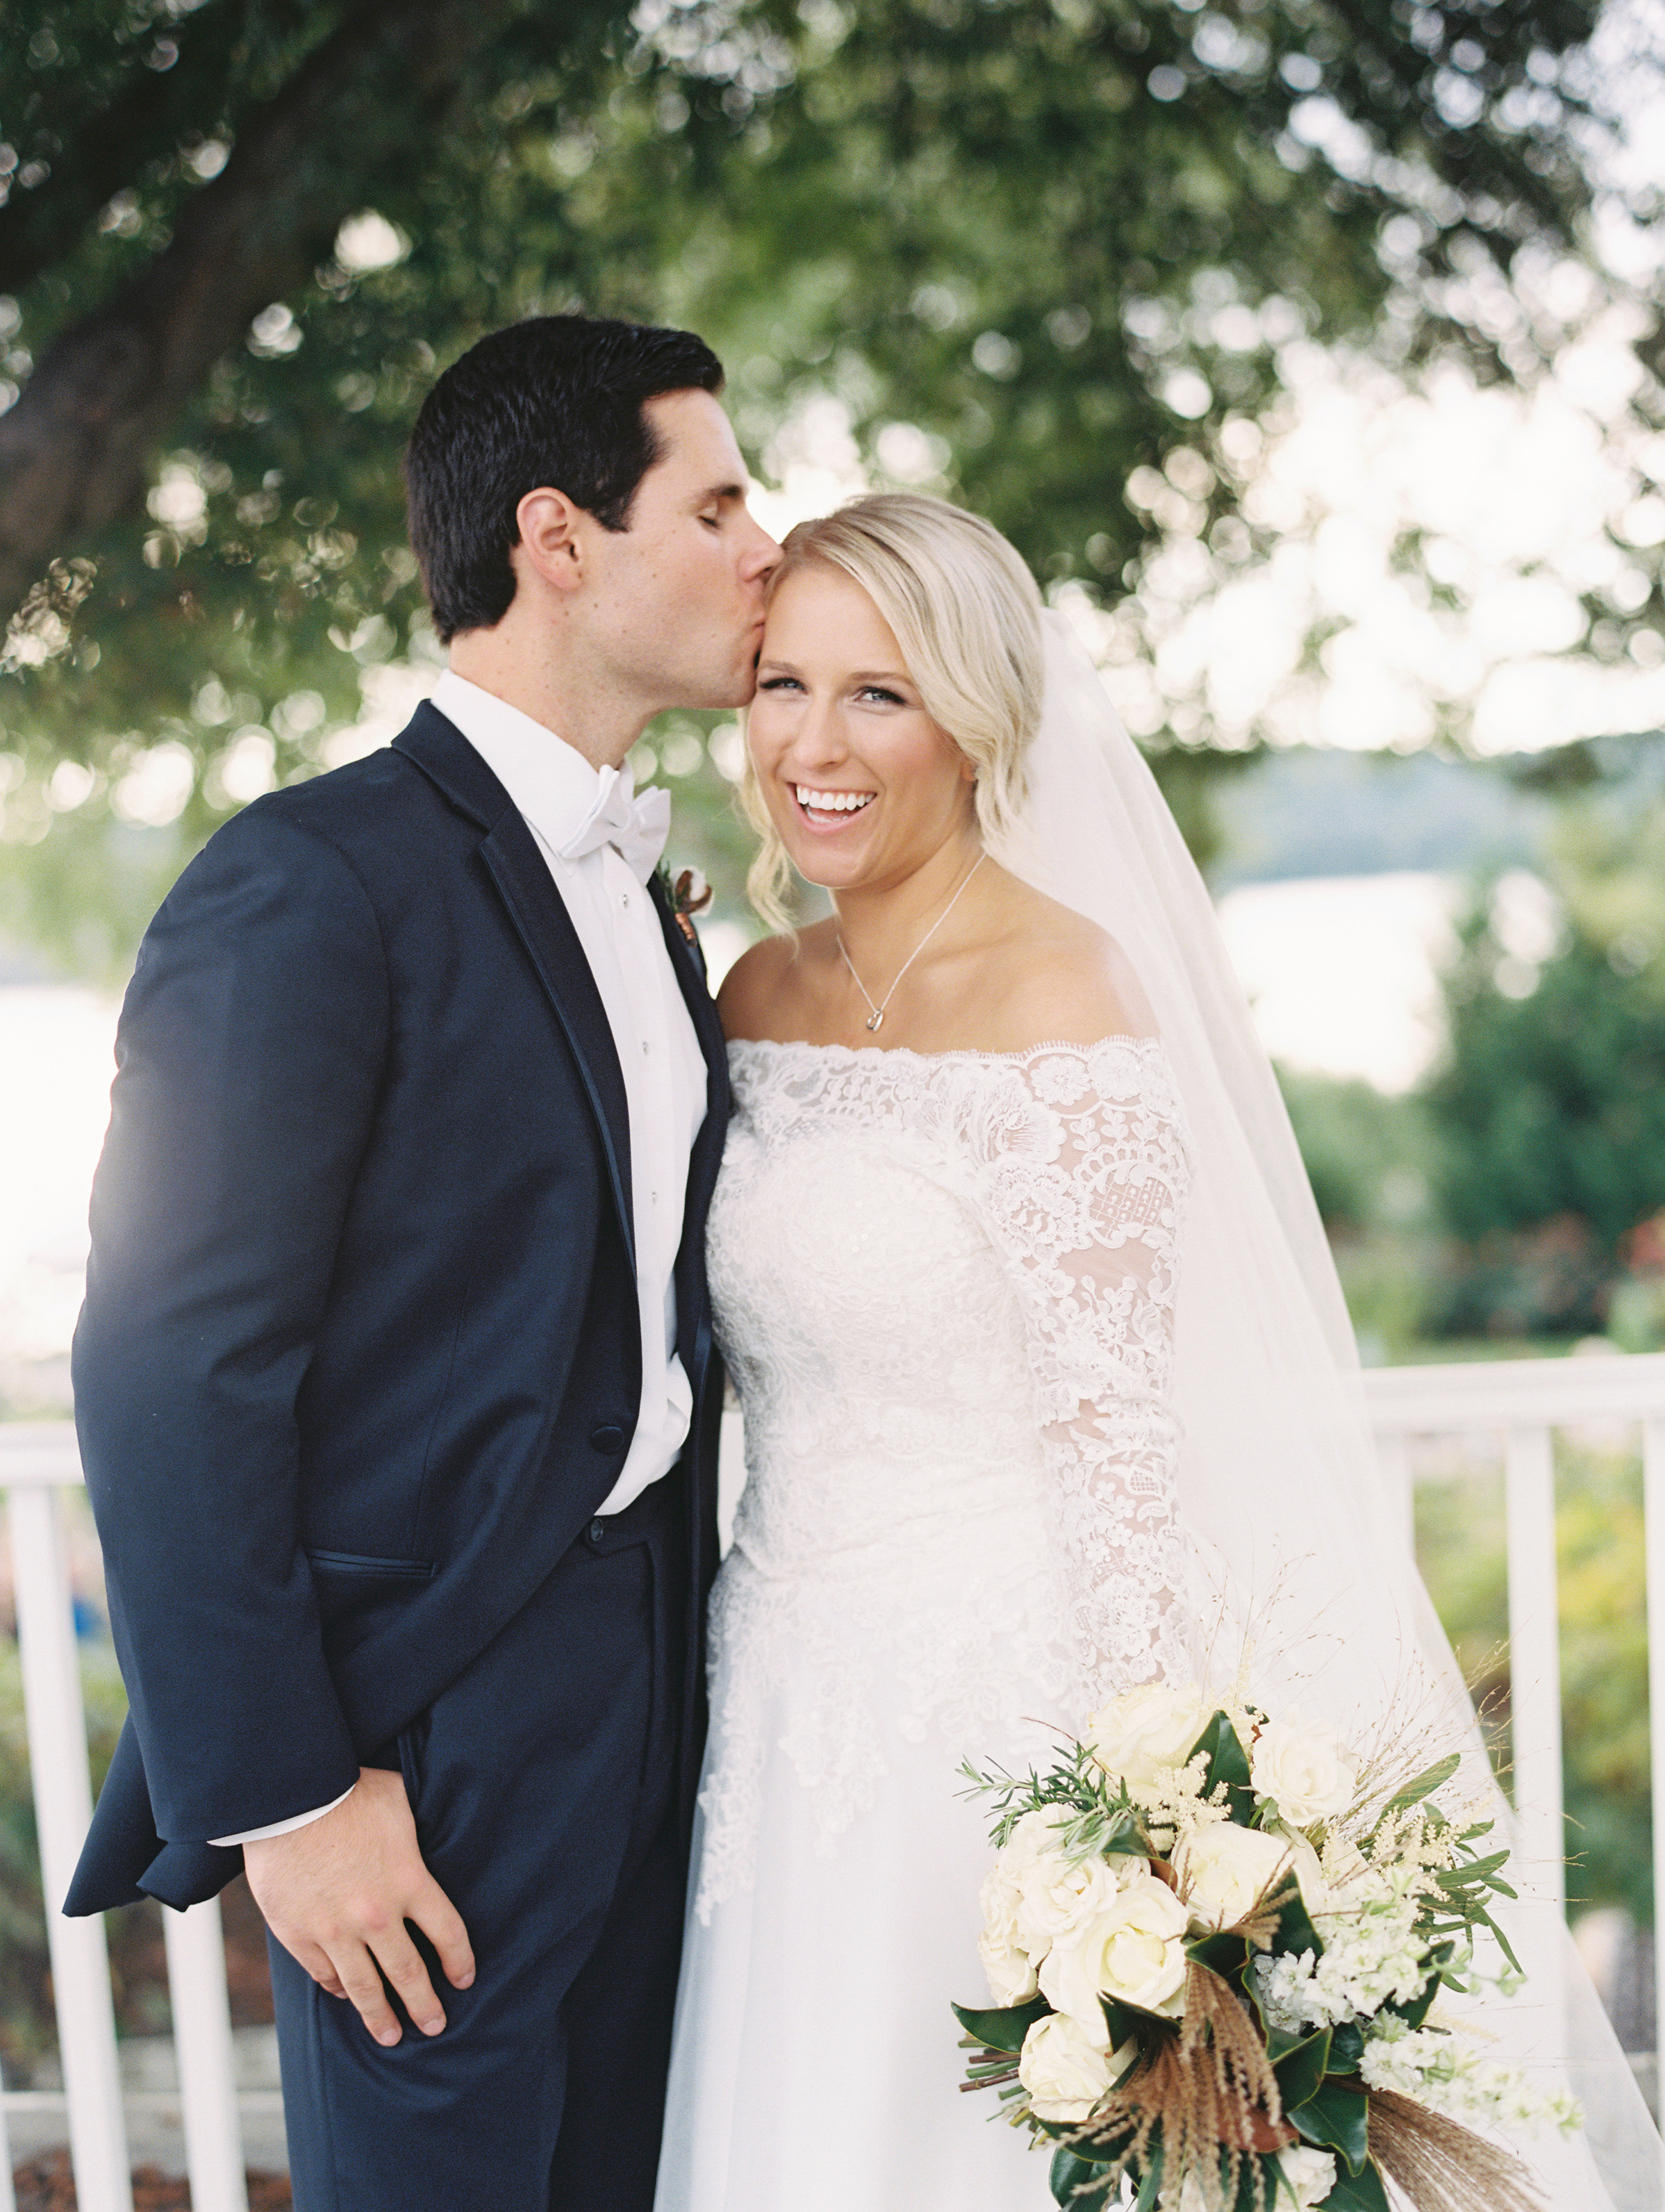 kendall nick wedding couple forehead kiss